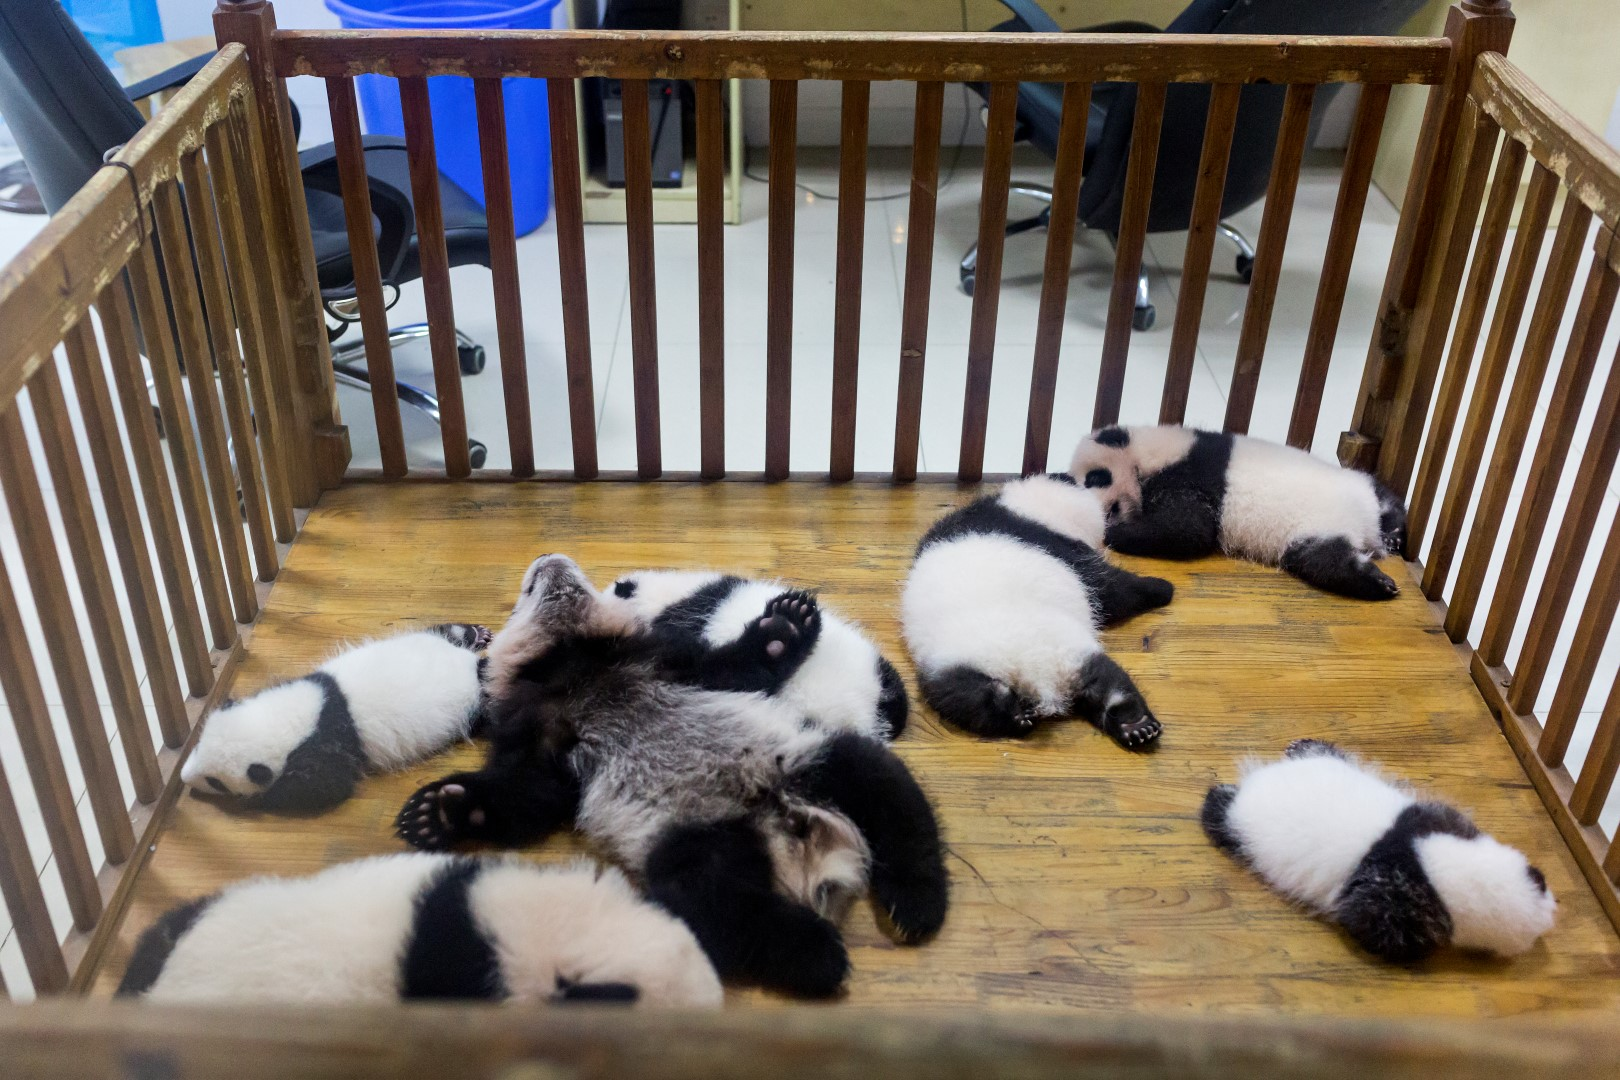 2-3 months old Panda cubs